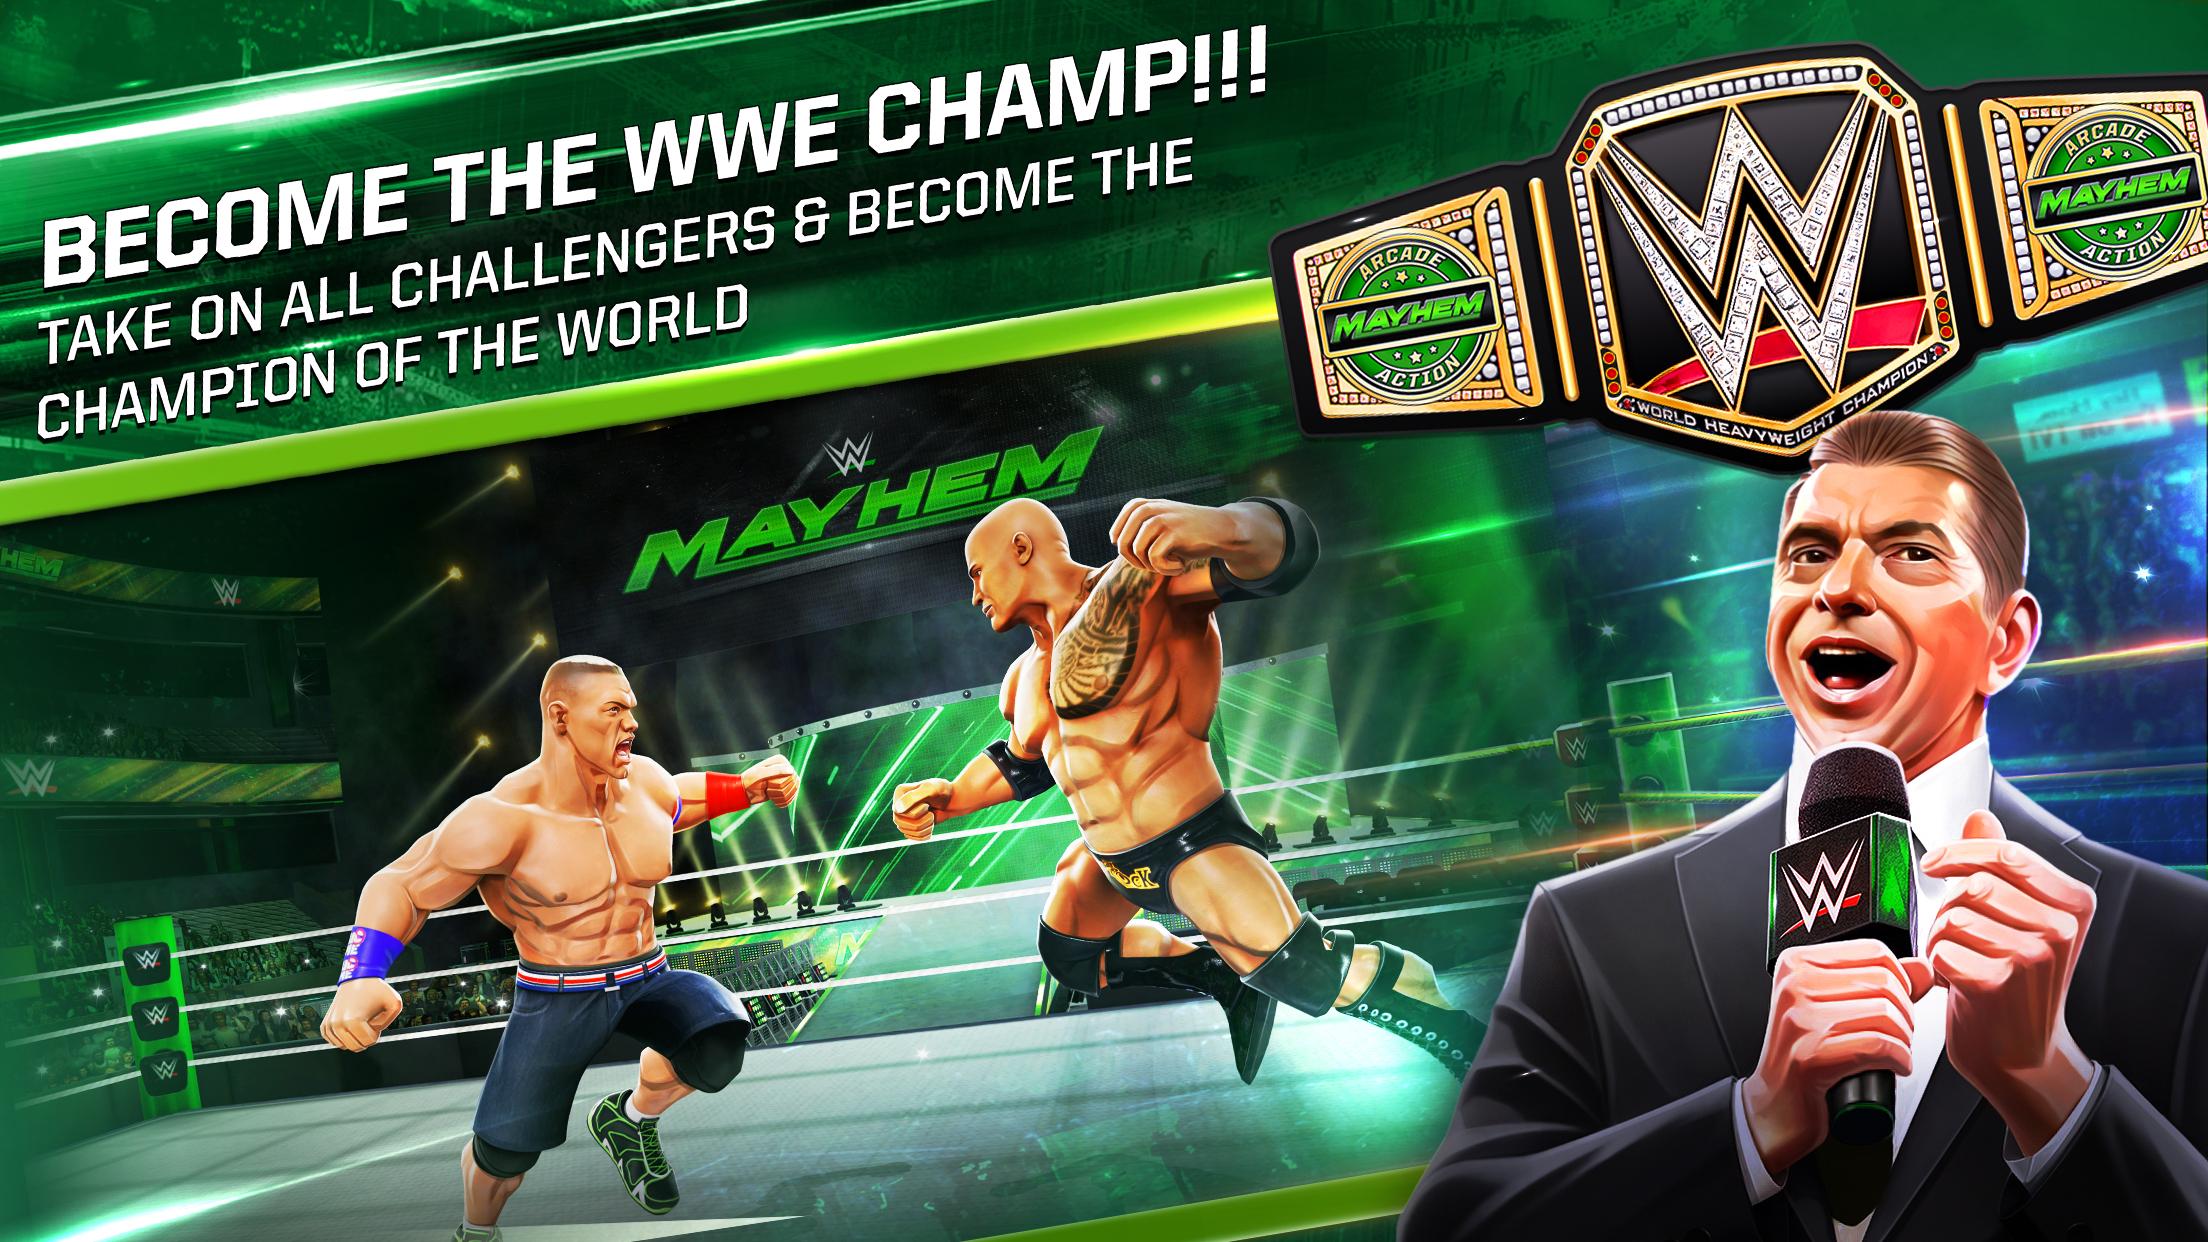 Screenshot 06 - Become a Champion.jpeg